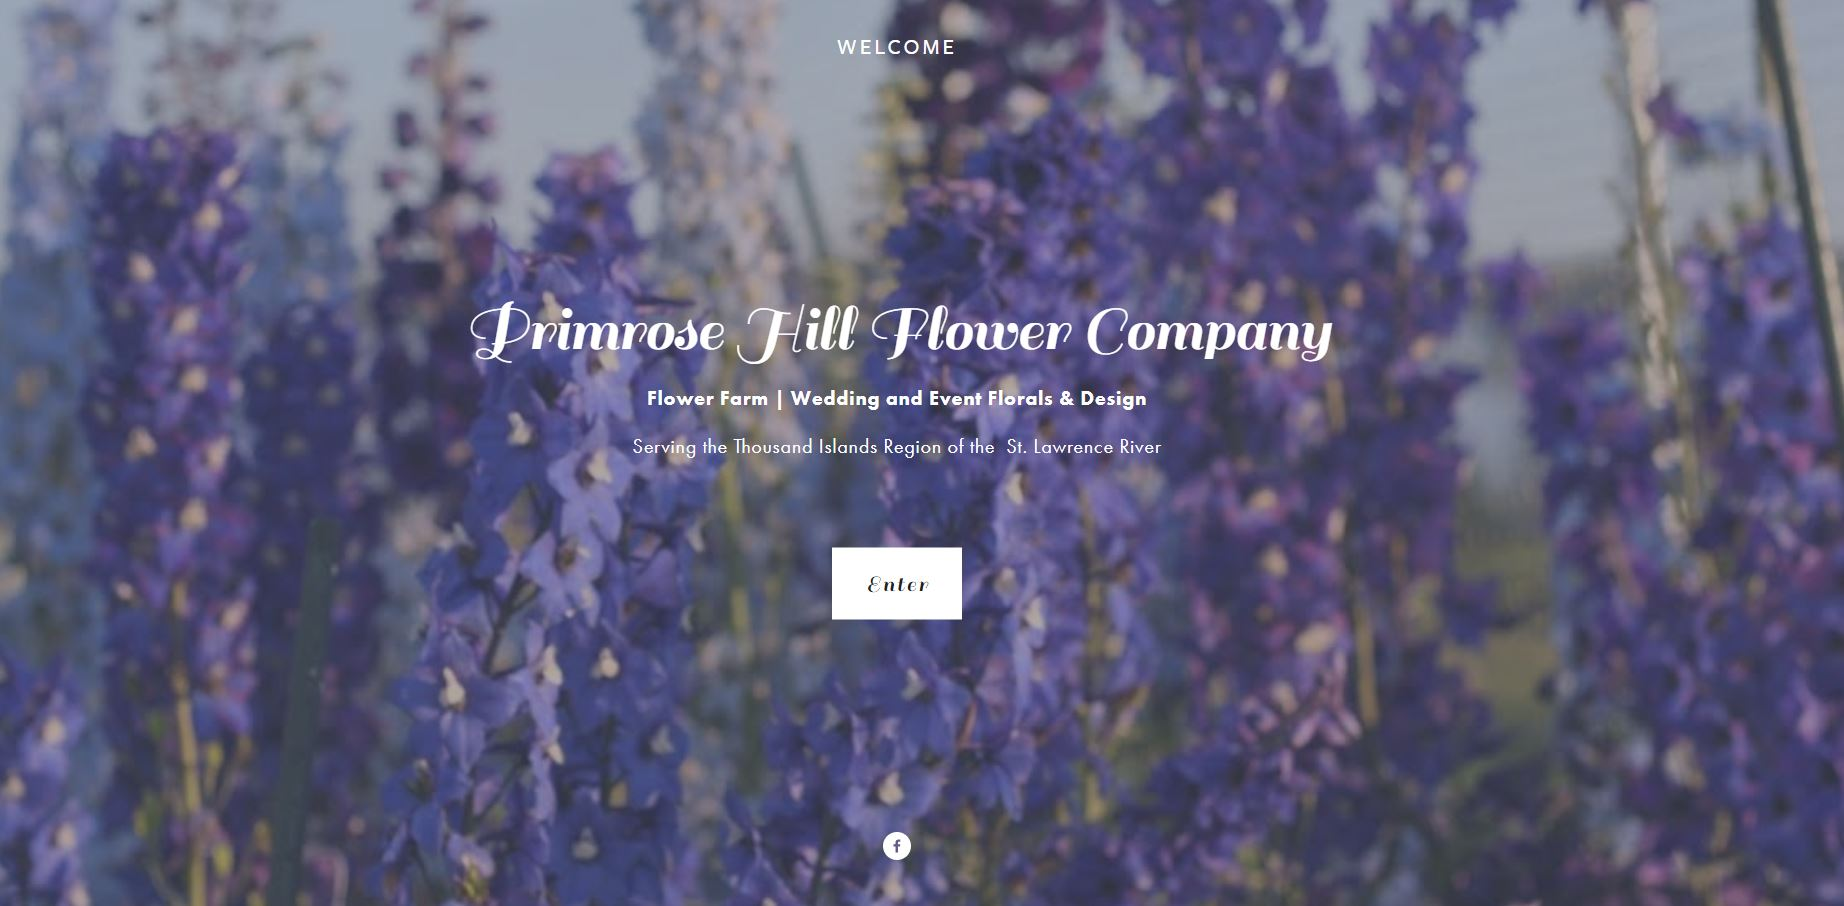 Primrose Hill Flower Company